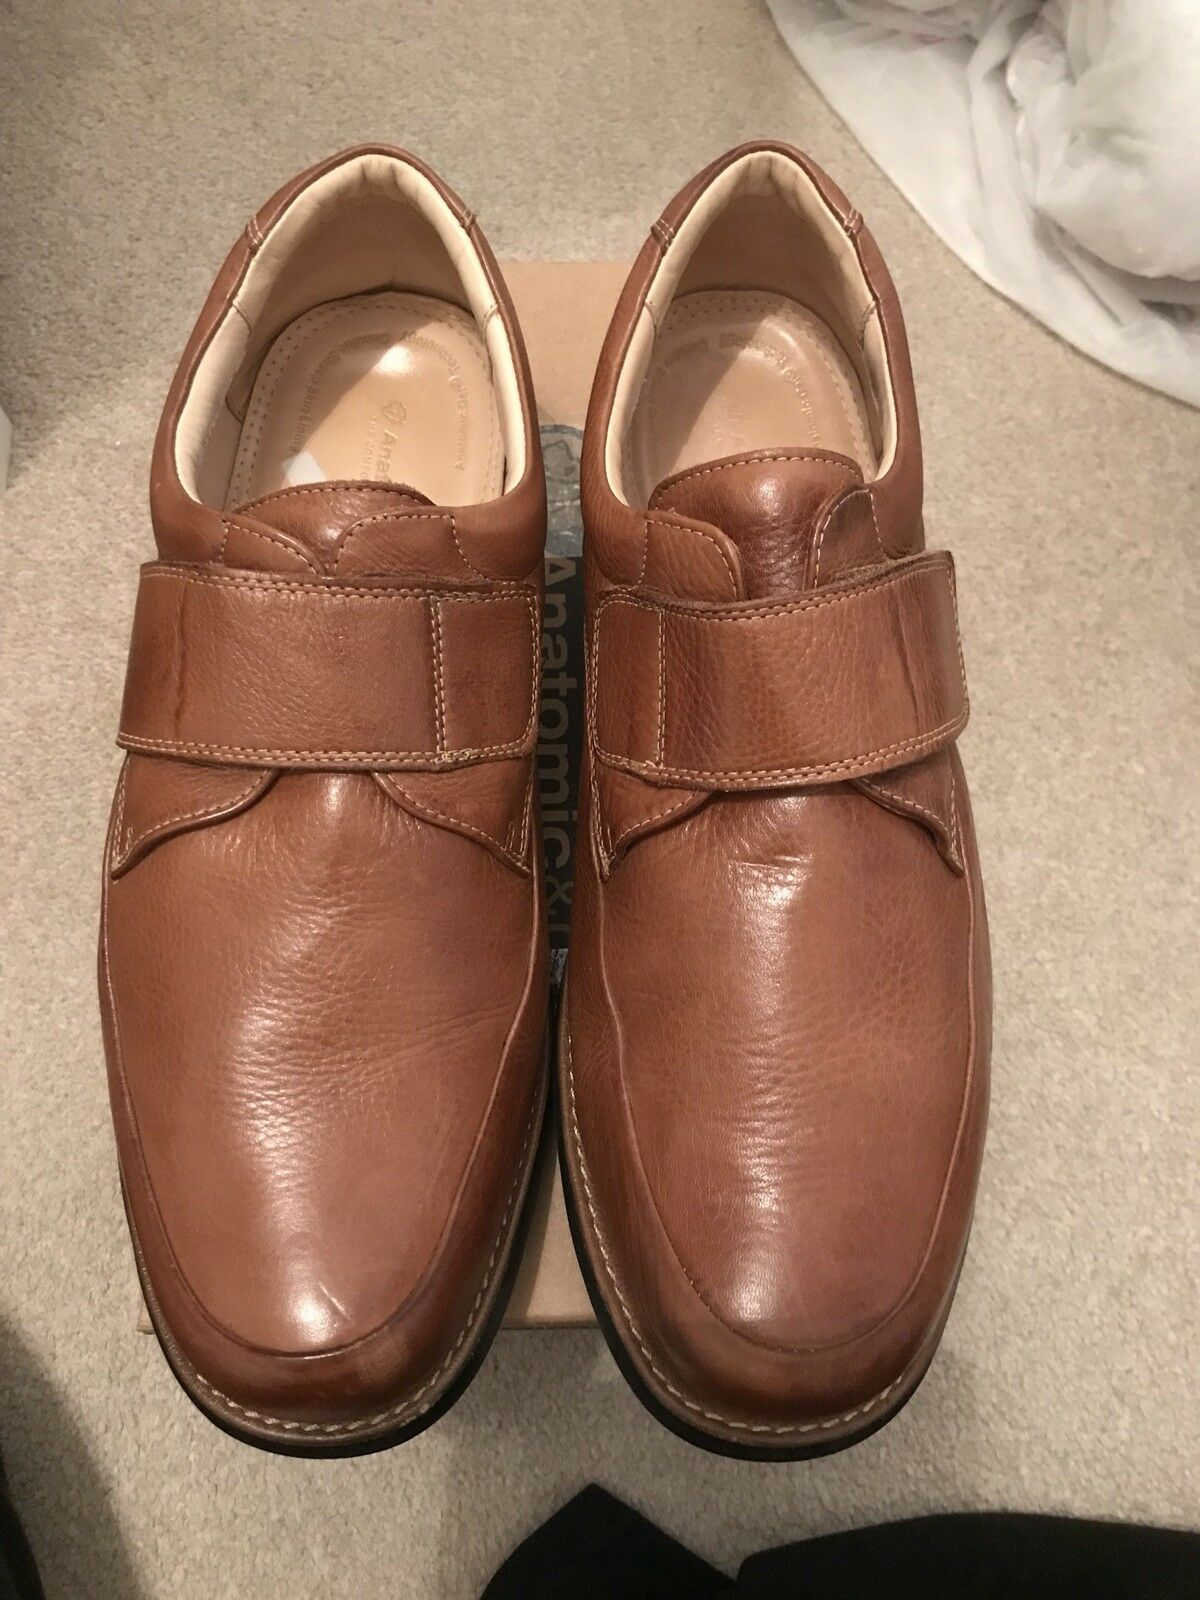 Anatomic & RRP Co Tan Leather Shoes Size 12 RRP & ea76e9